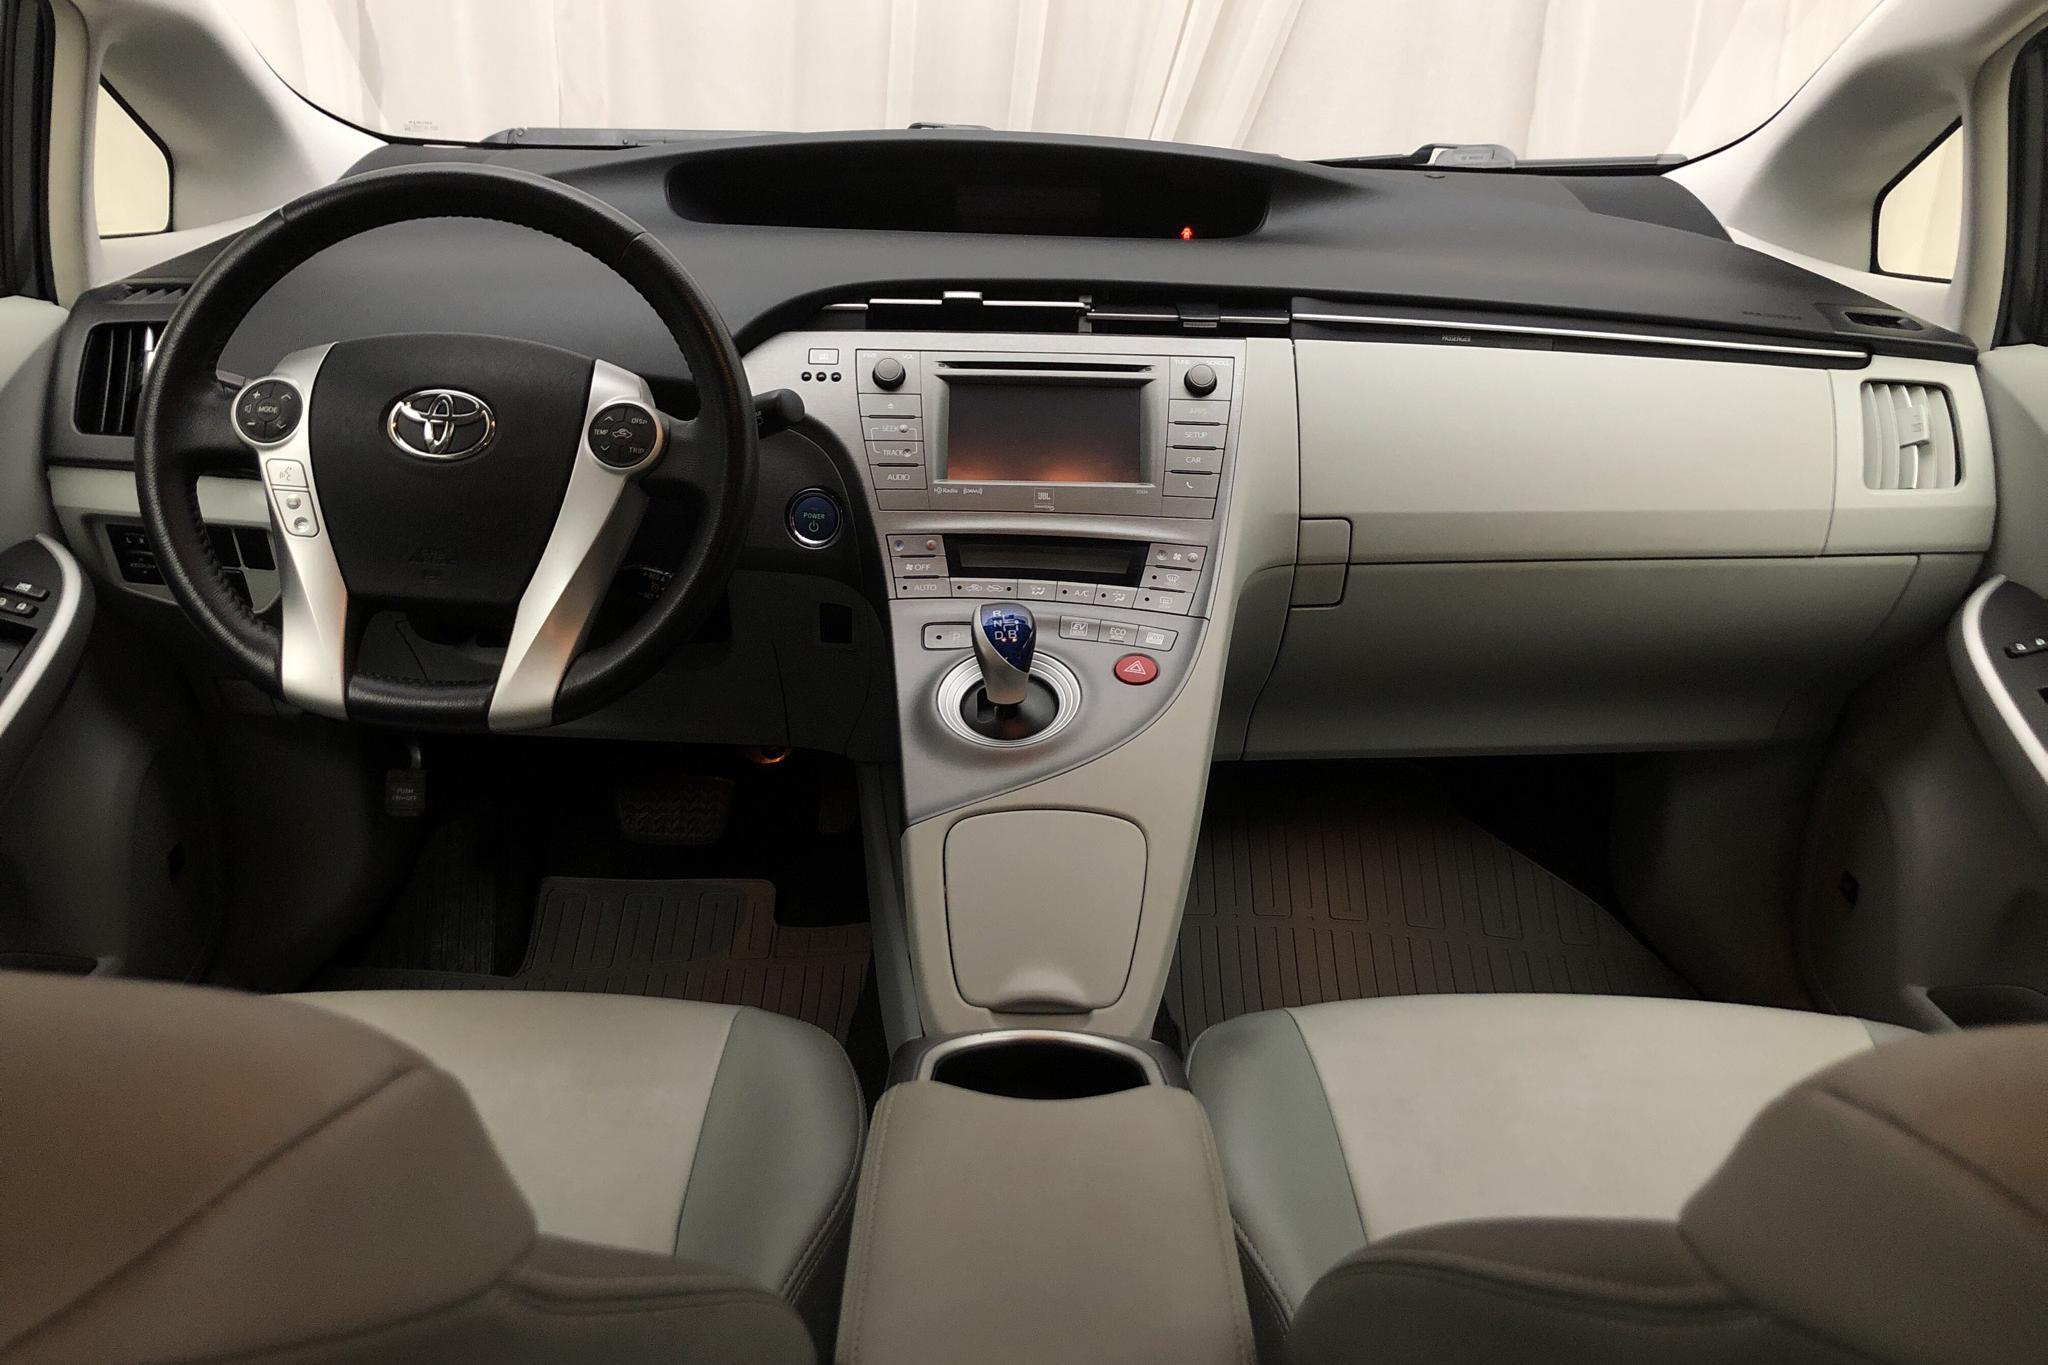 Toyota Prius 1.8 Hybrid (136hk) - 129 600 km - Automatic - Dark Grey - 2012